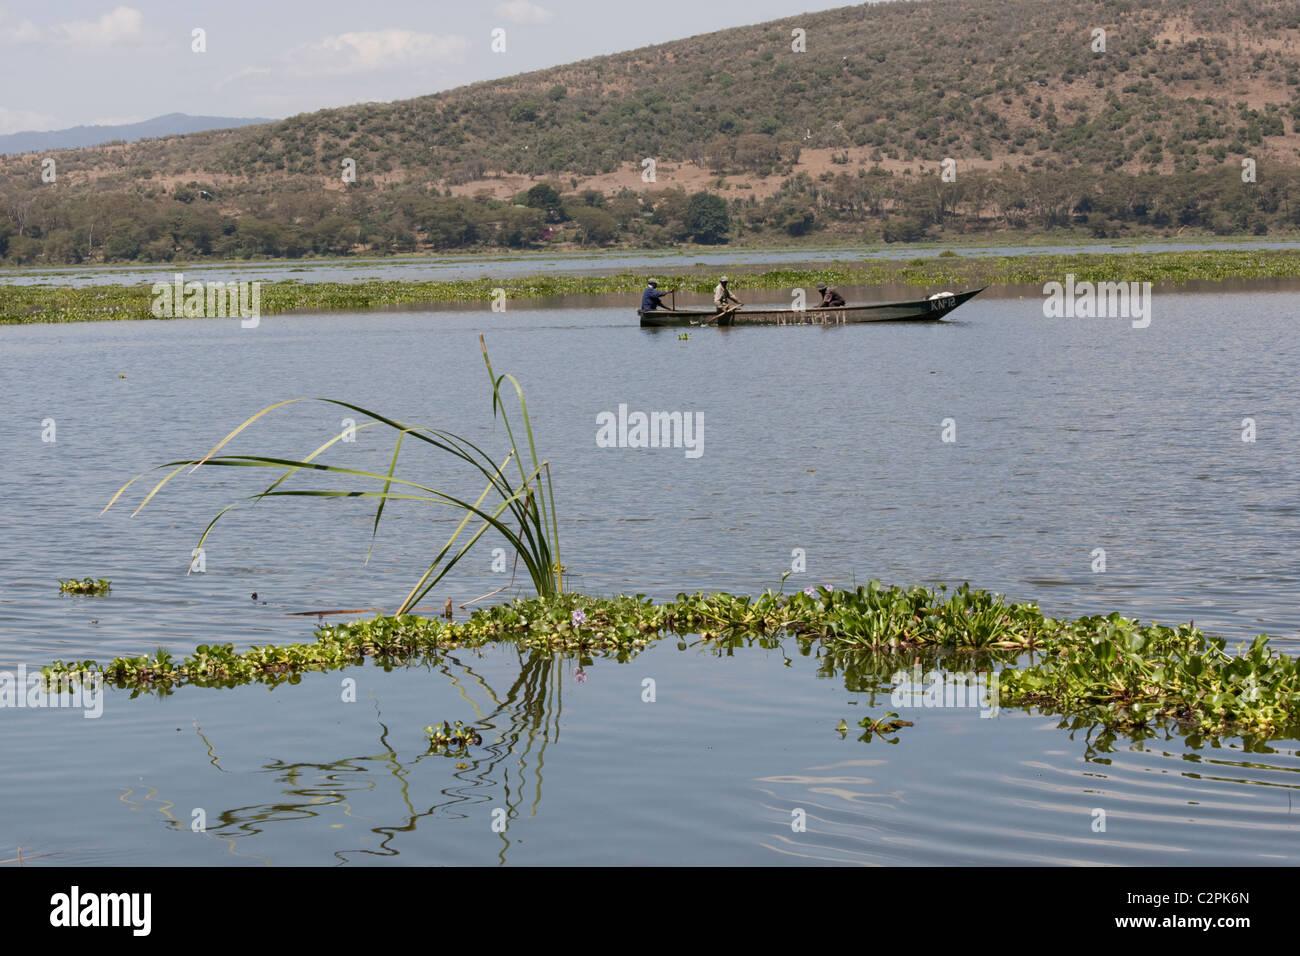 Fishermen in dugout canoe surround by water hyacinth invading Lake Naivasha Elsamere Rift Valley Kenya Stock Photo